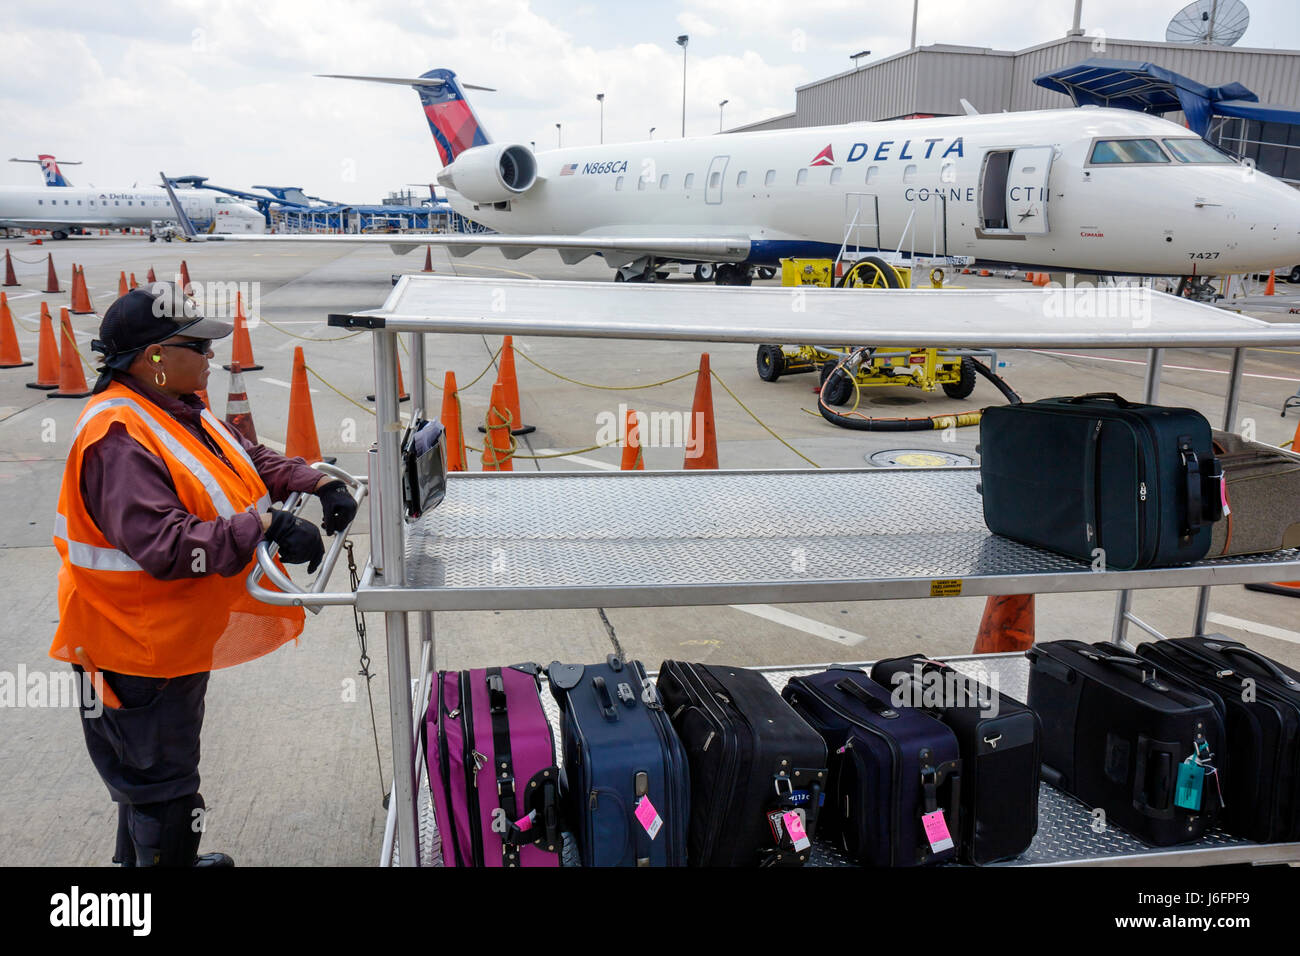 Atlanta Georgia Hartsfield-Jackson Atlanta International Airport CRJ100 jet regional airliner Delta Connection commuter - Stock Image